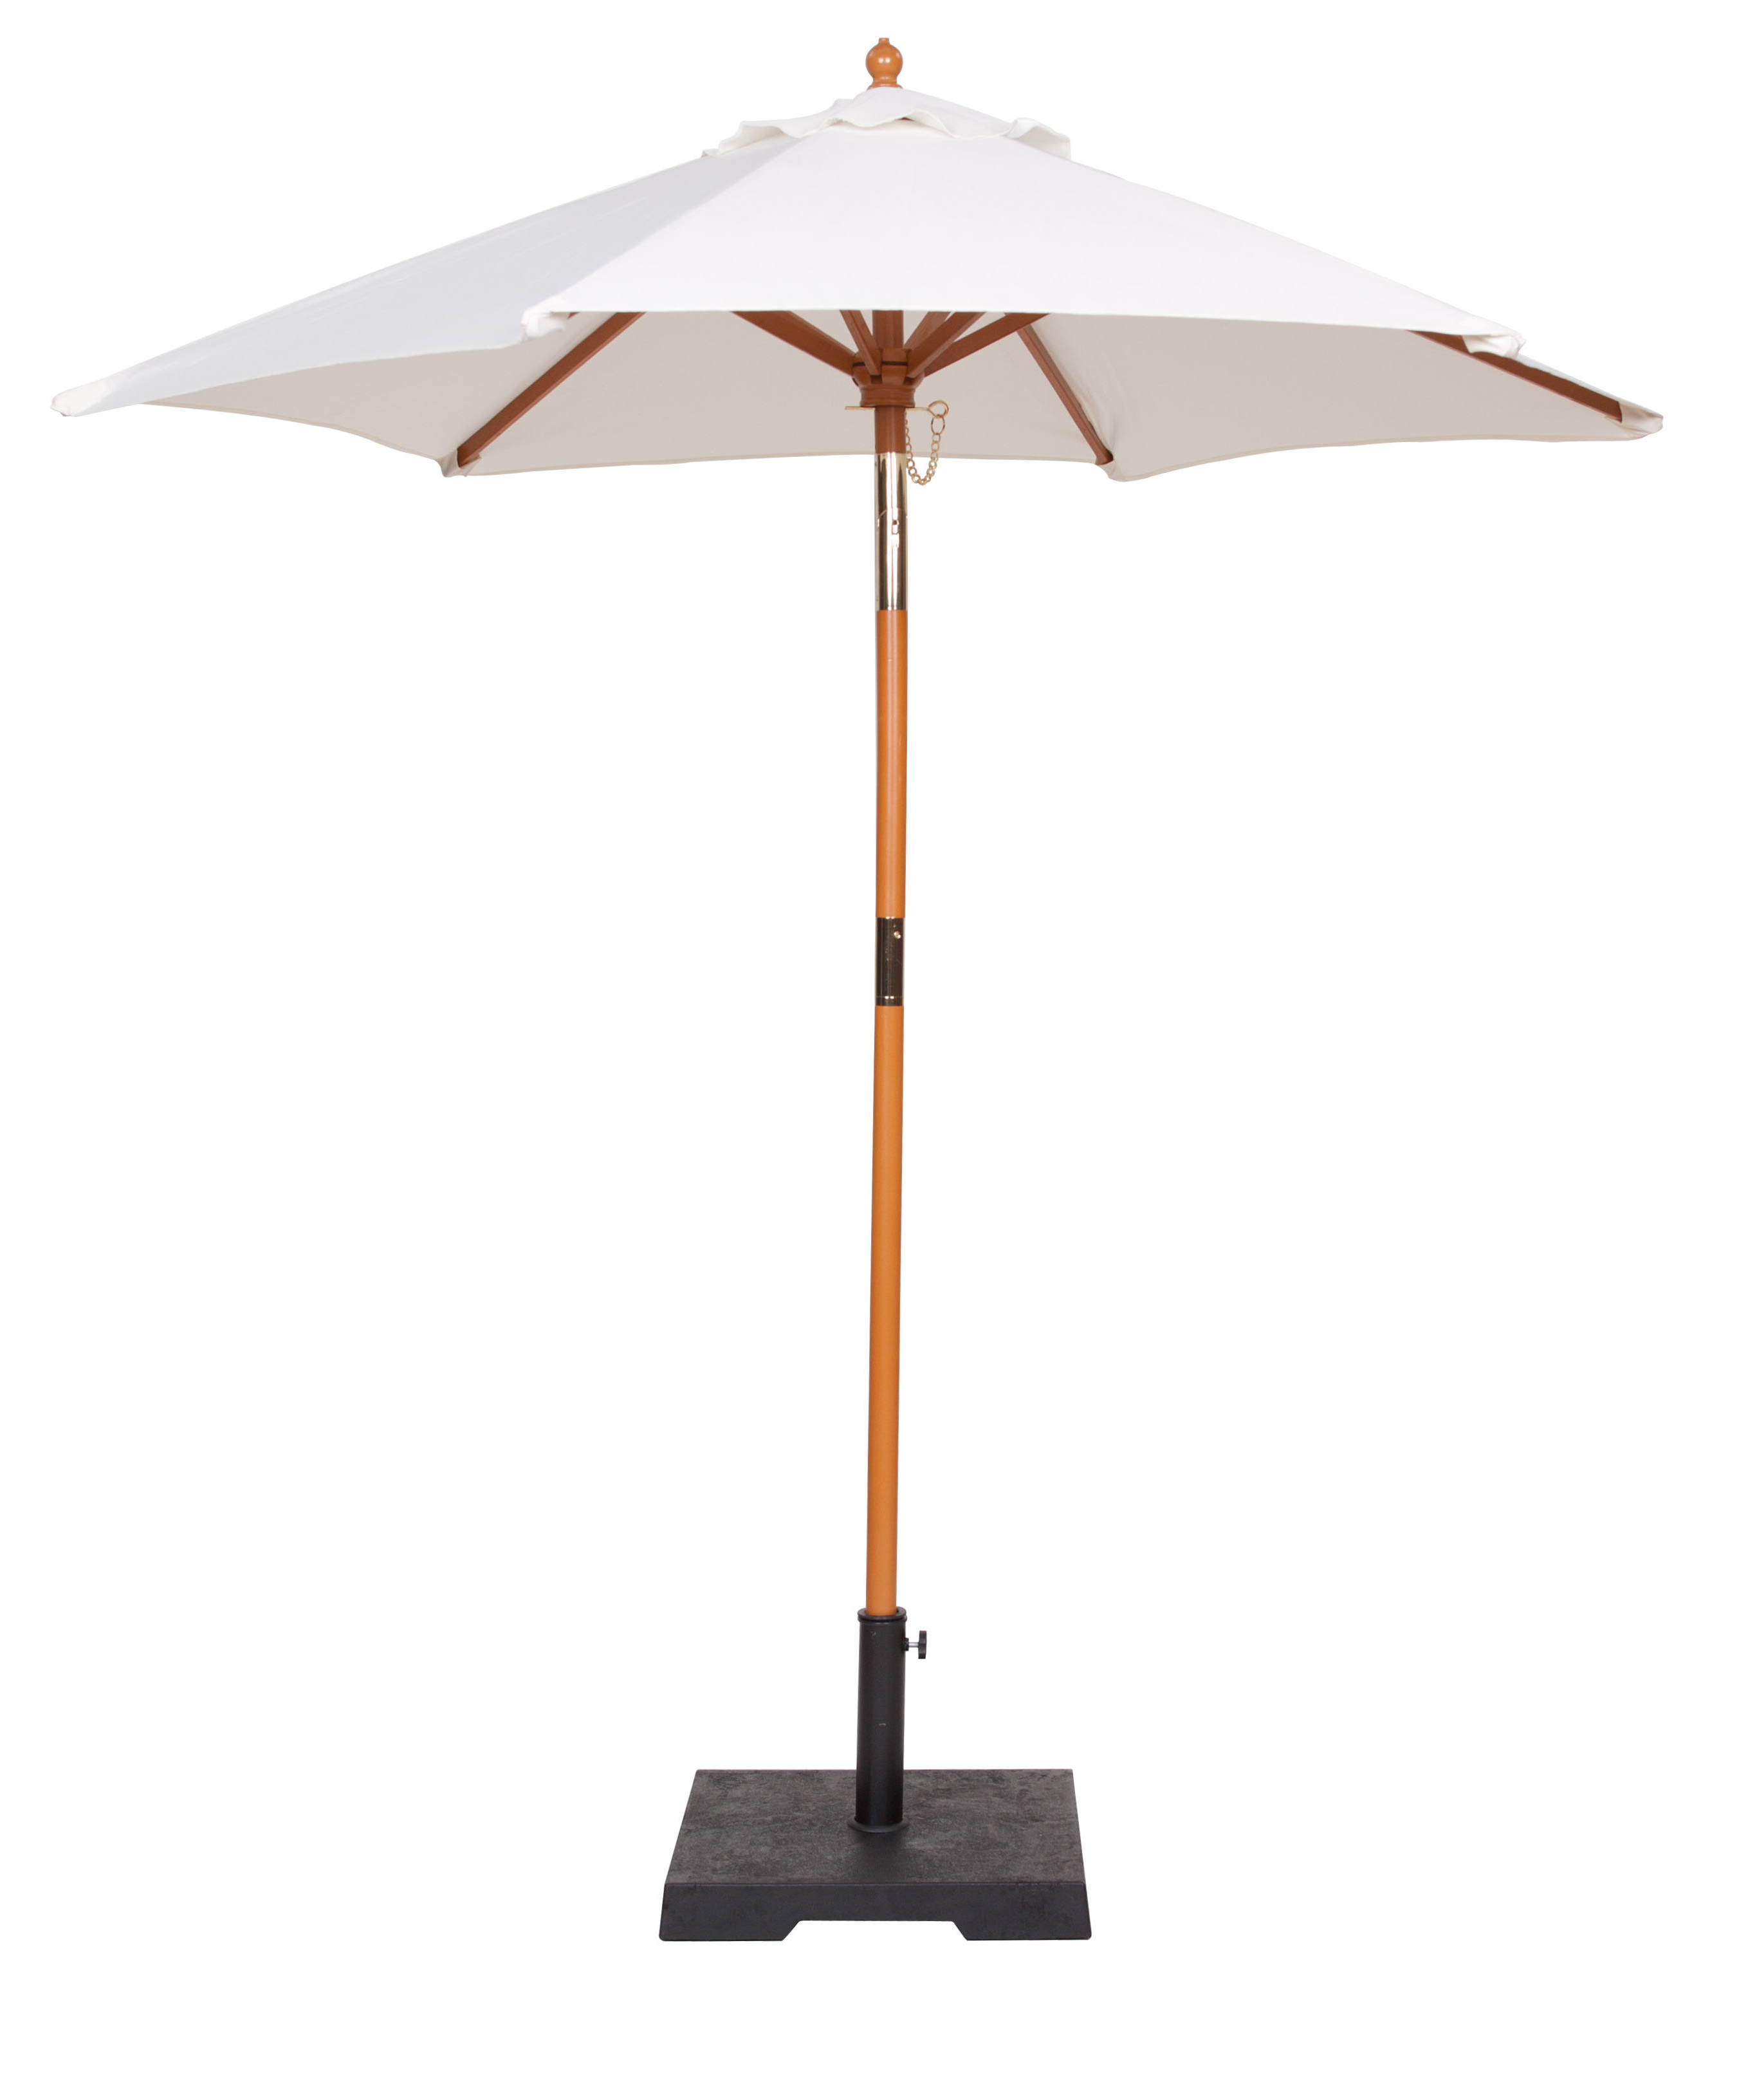 2020 Shropshire Market Umbrella Within Devansh Market Umbrellas (View 12 of 20)